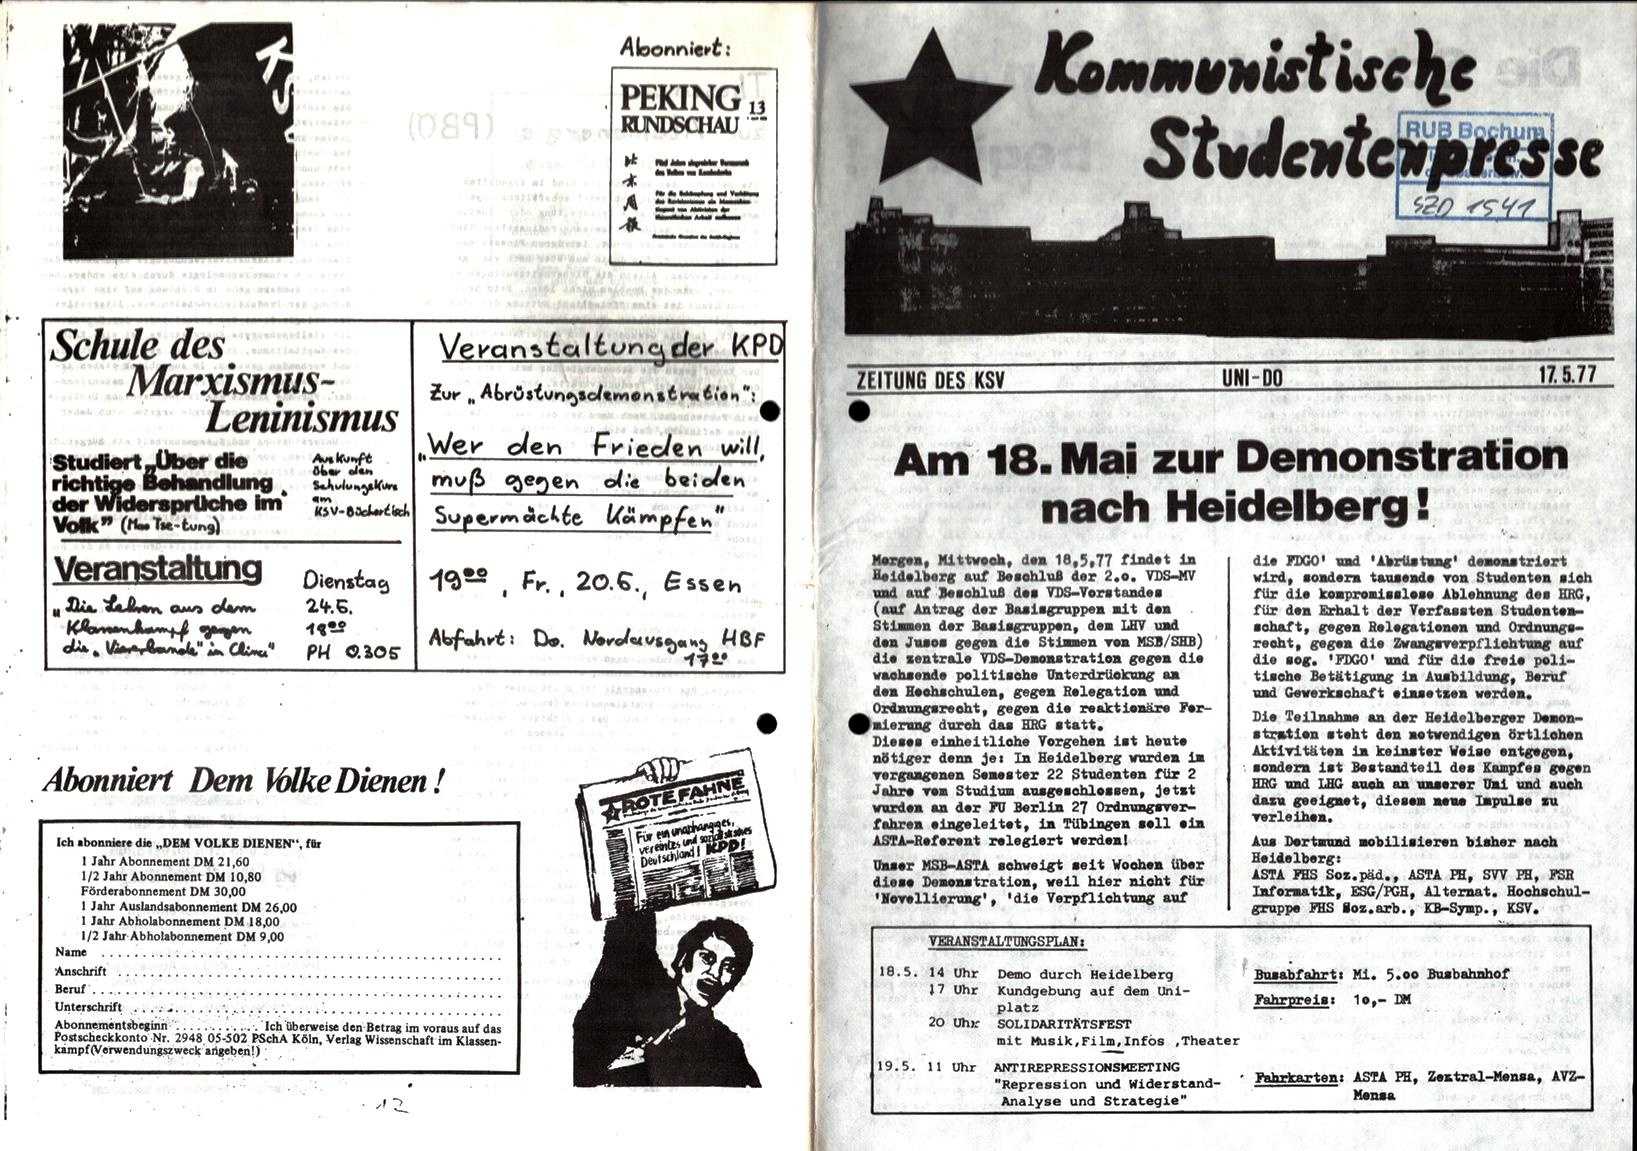 Dortmund_KSV_Studentenpresse_Uni_1977_05_17_001